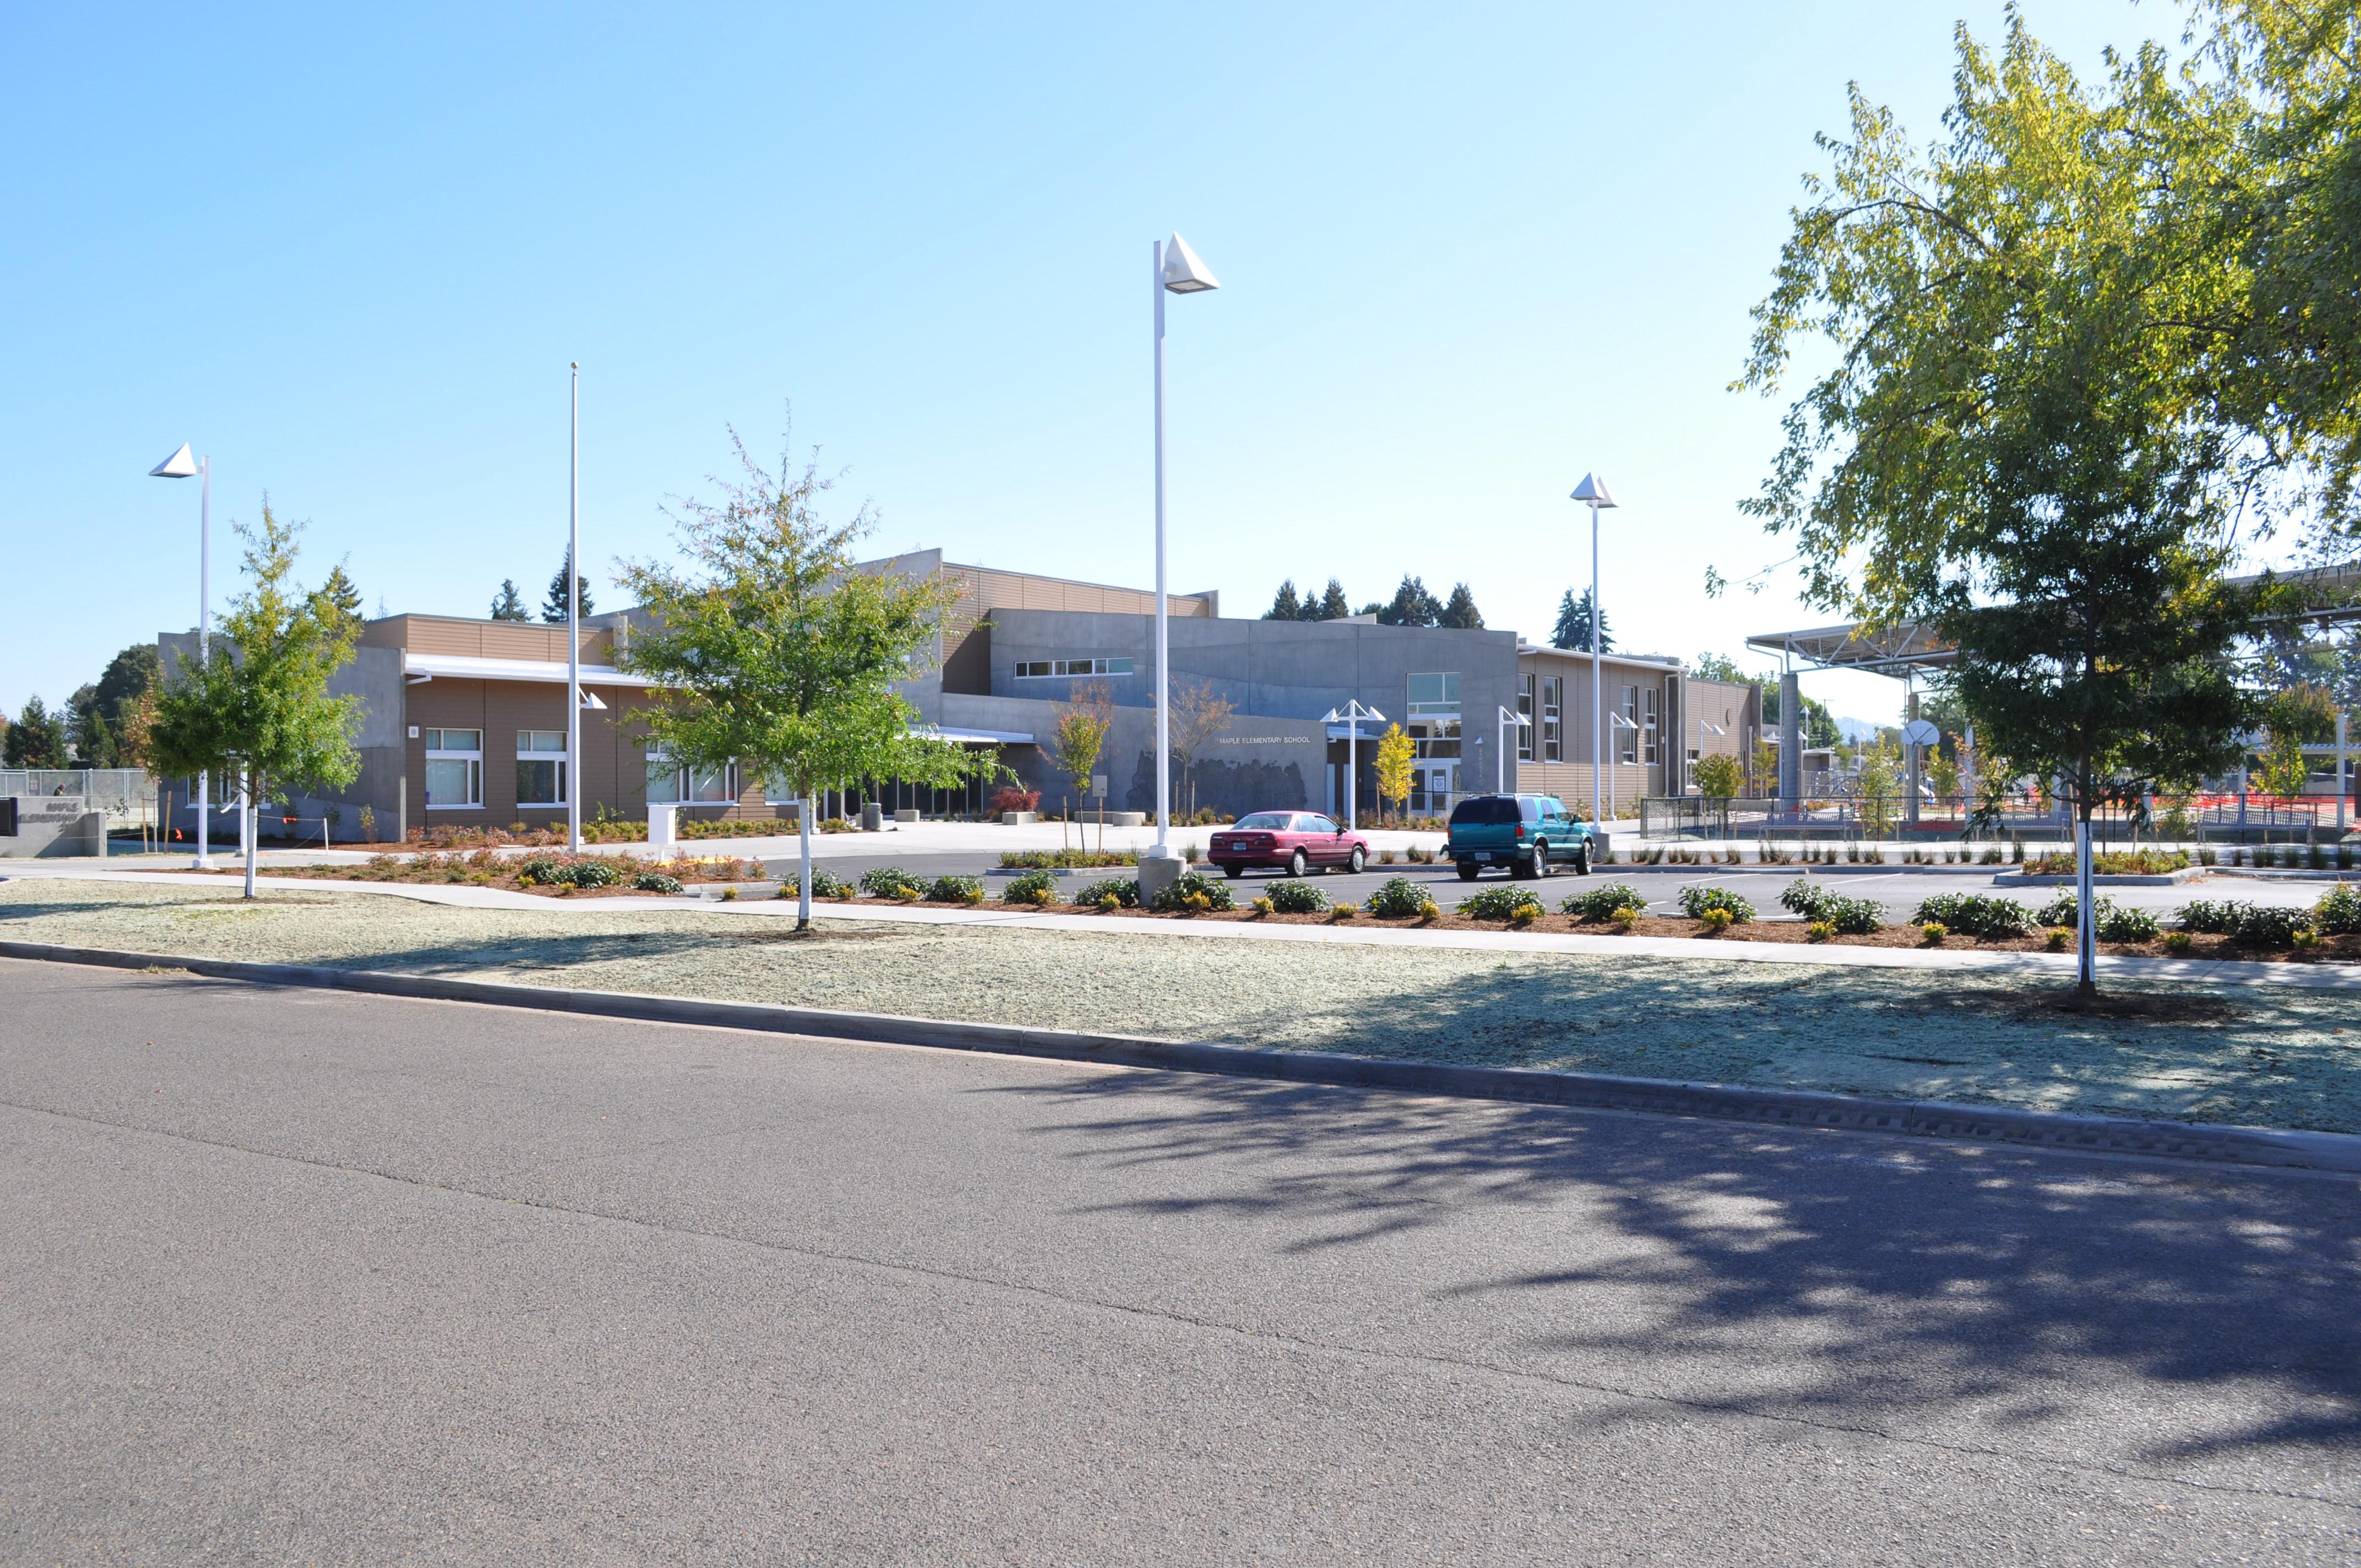 Maple Elementary School